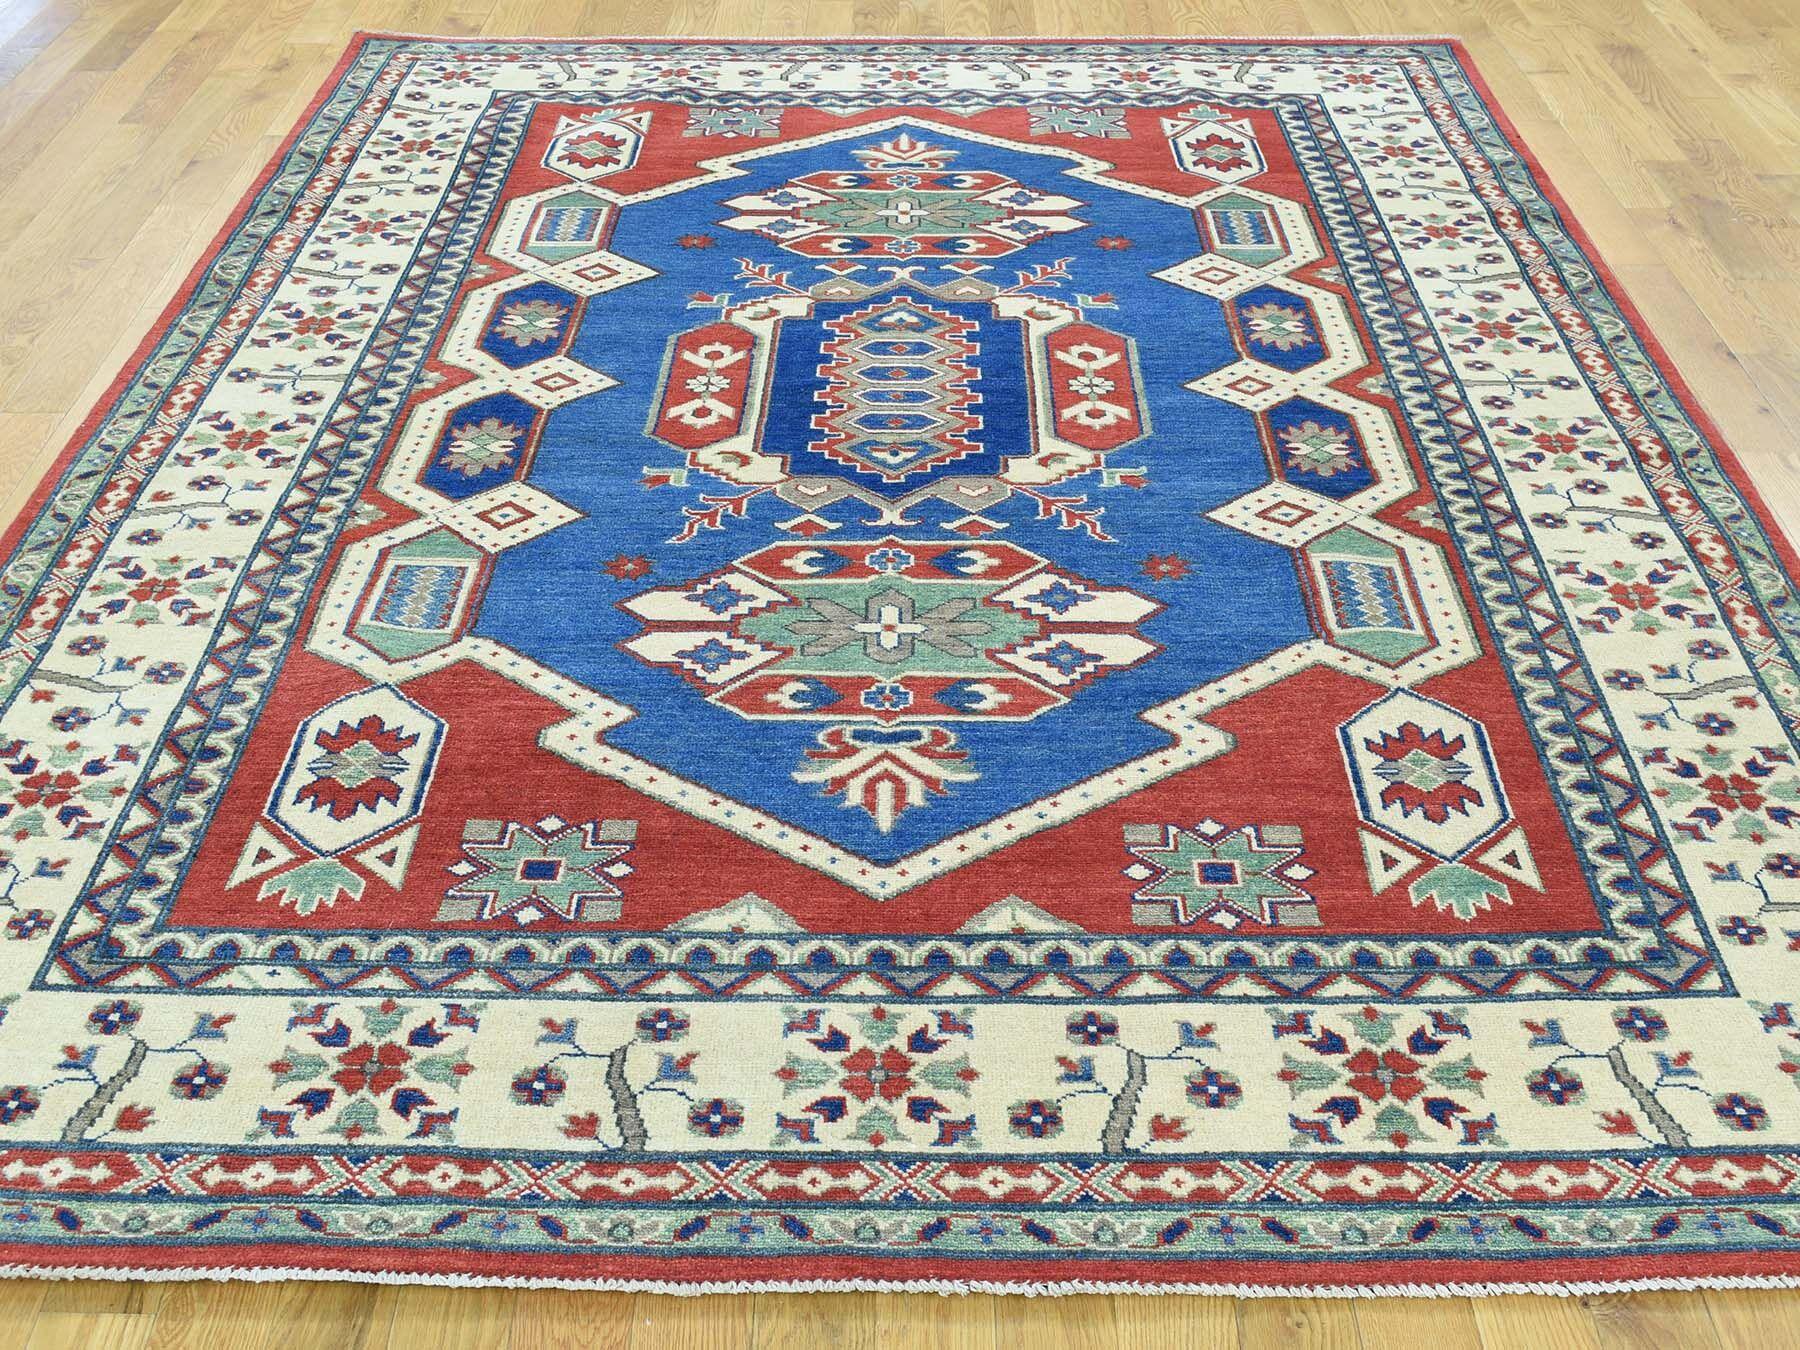 One-of-a-Kind Bernhard Kazak Tribal Geometric Design Handwoven Blue Wool Area Rug